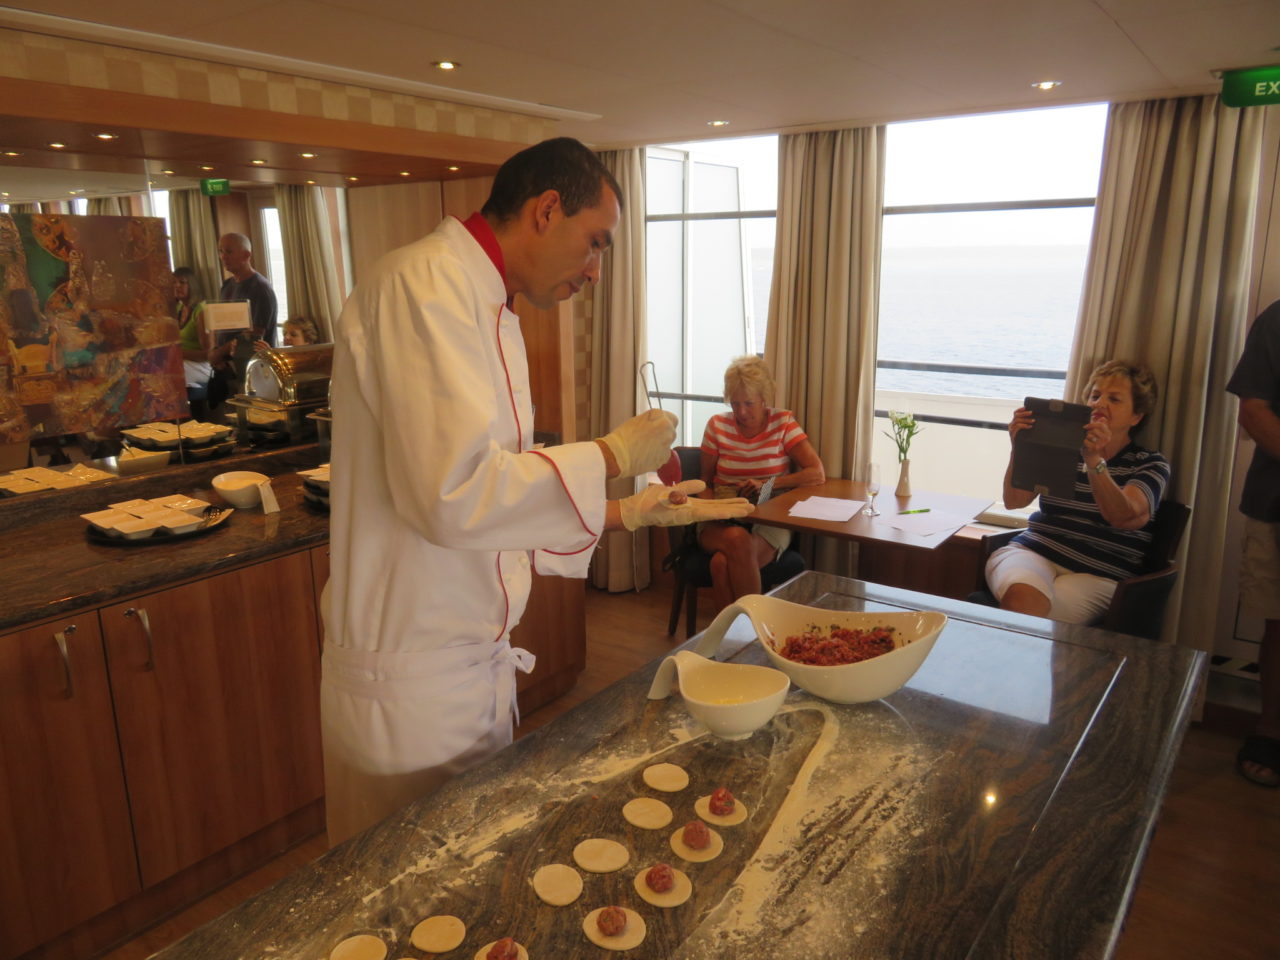 Russian Pelmeni cooking lesson by Executive Chef Danilo aboard the Viking Akun river cruise ship while cruising the Volga River